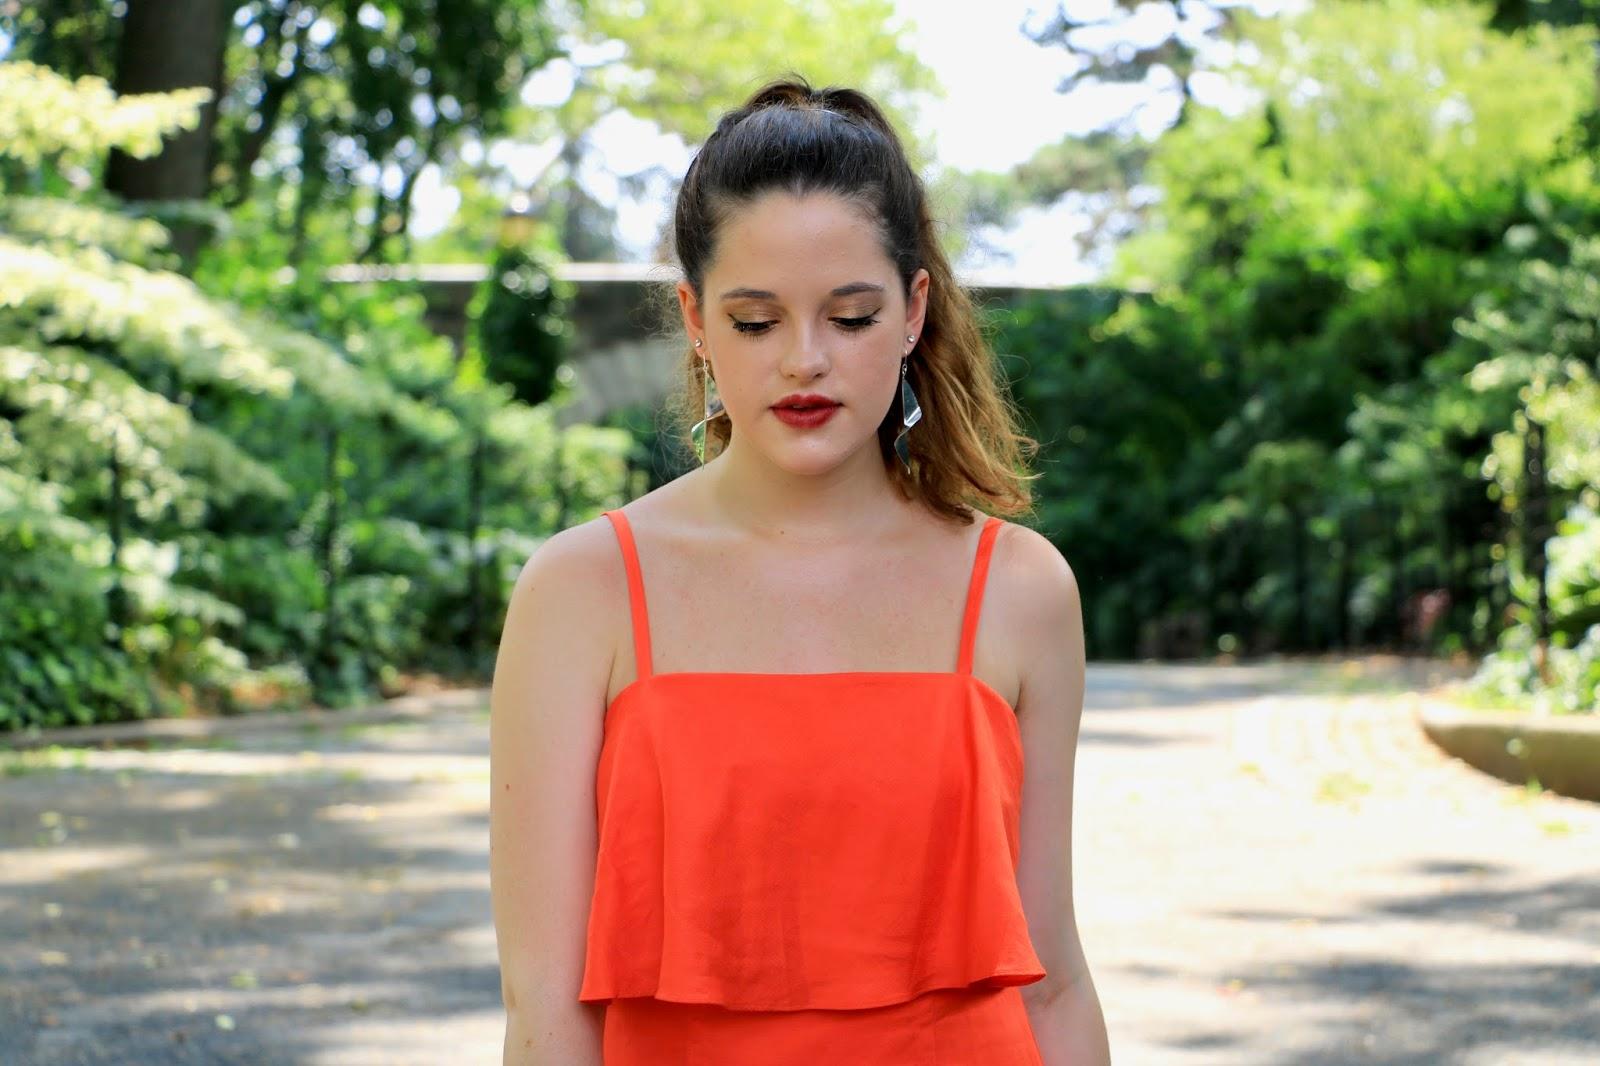 Fashion blogger Kathleen Harper of Kat's Fashion Fix in summer wedding makeup